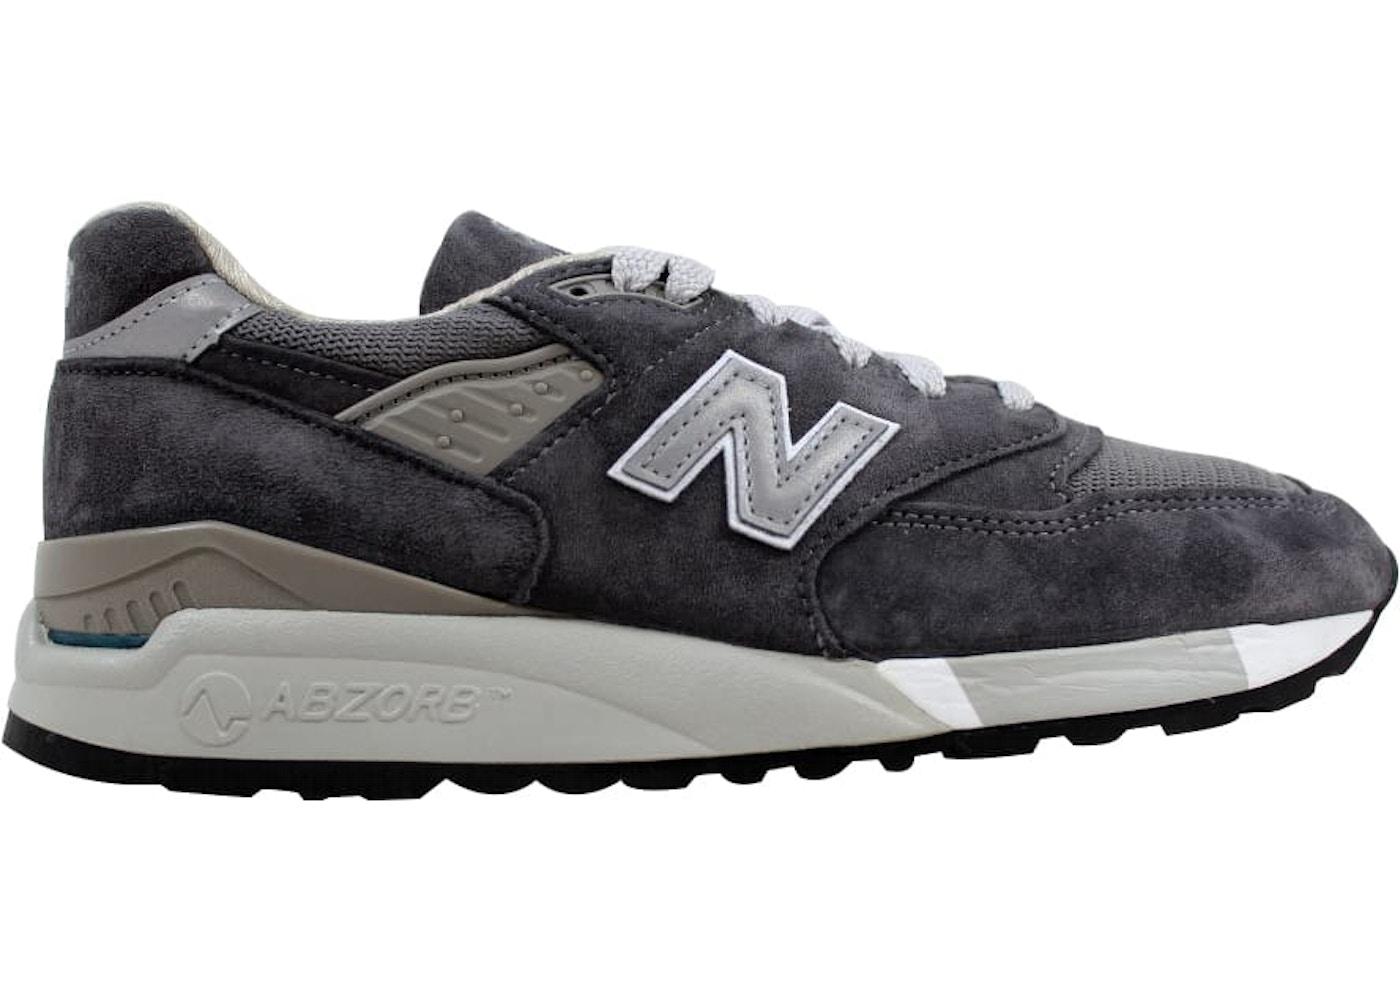 on sale d3773 2f90e New Balance 998 Grey/Charcoal (W)